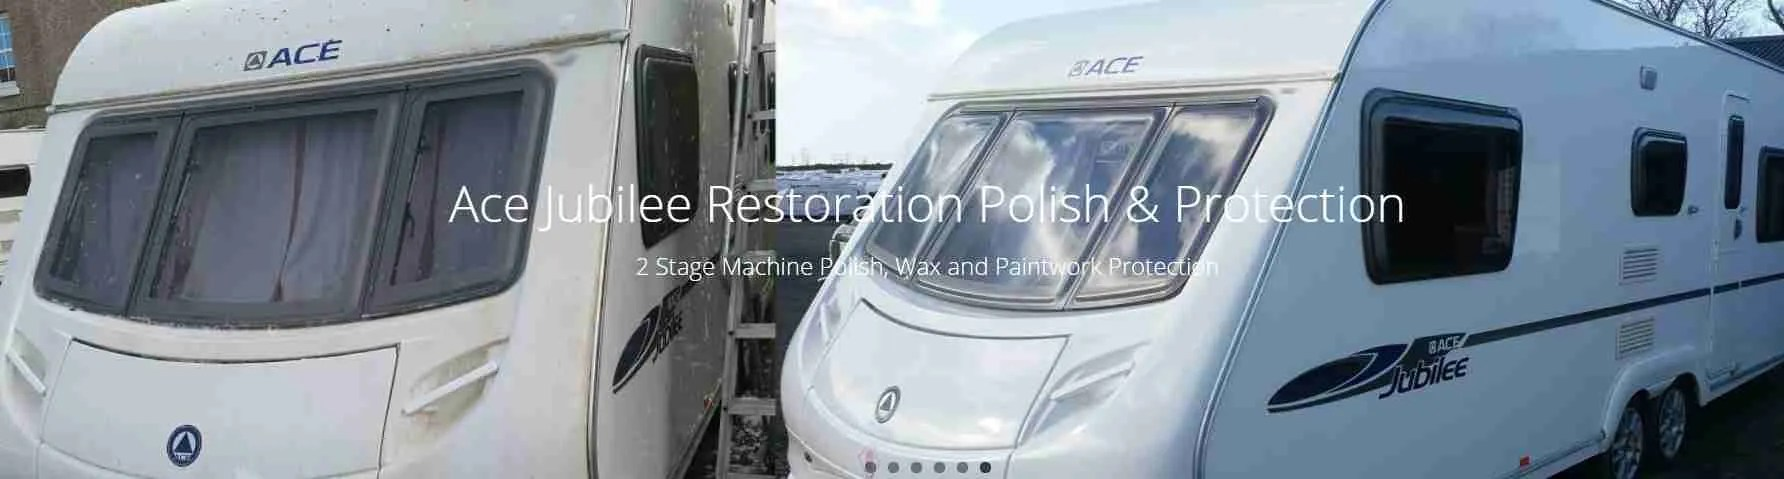 Caravan Polishing Near Blackpool